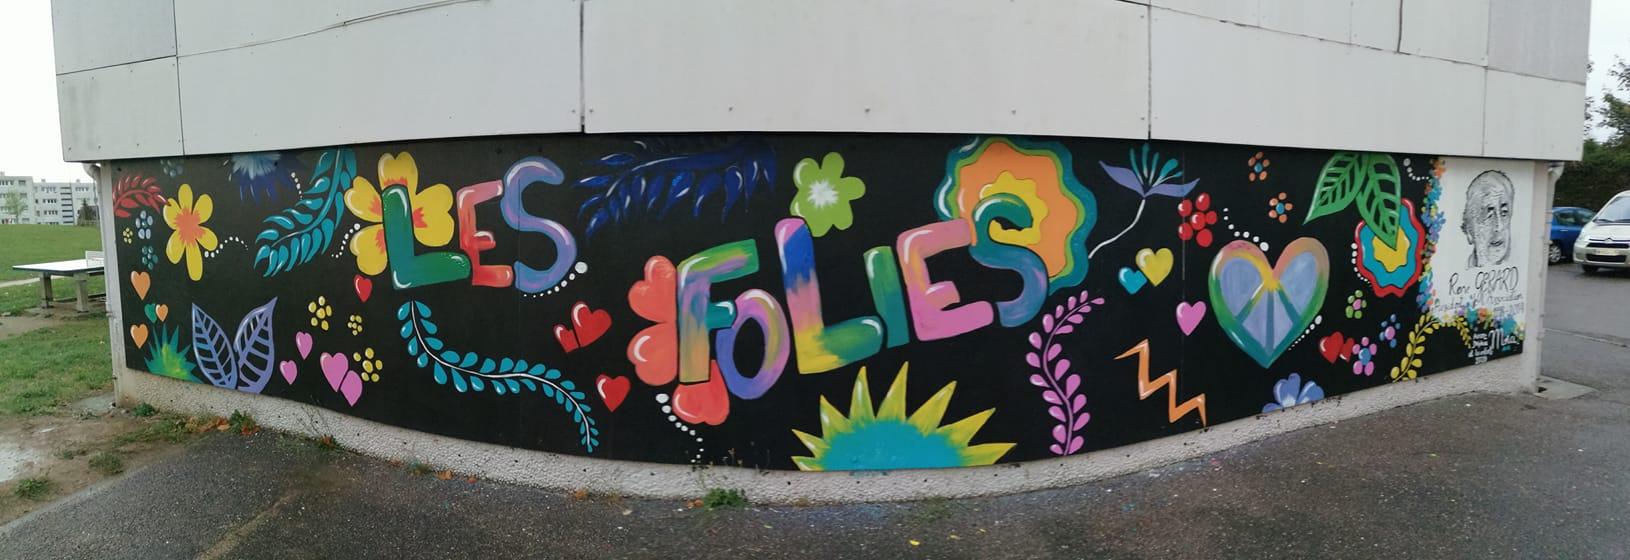 Folies-09